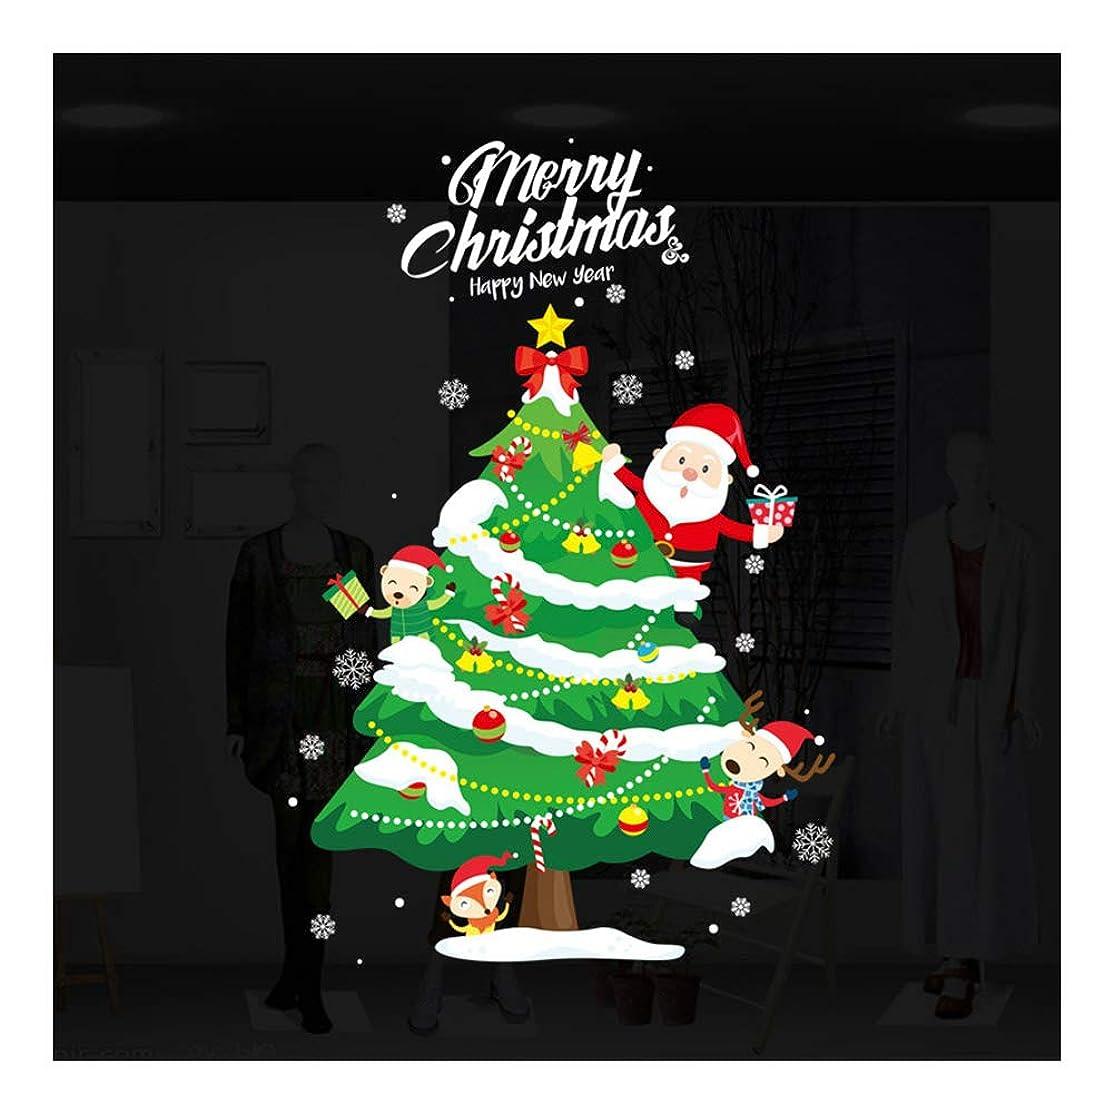 Profeel クリスマスウィンドウステッカーサンタクロース取り外し可能なPVCクリスマスツリーDIY壁窓ドア壁画